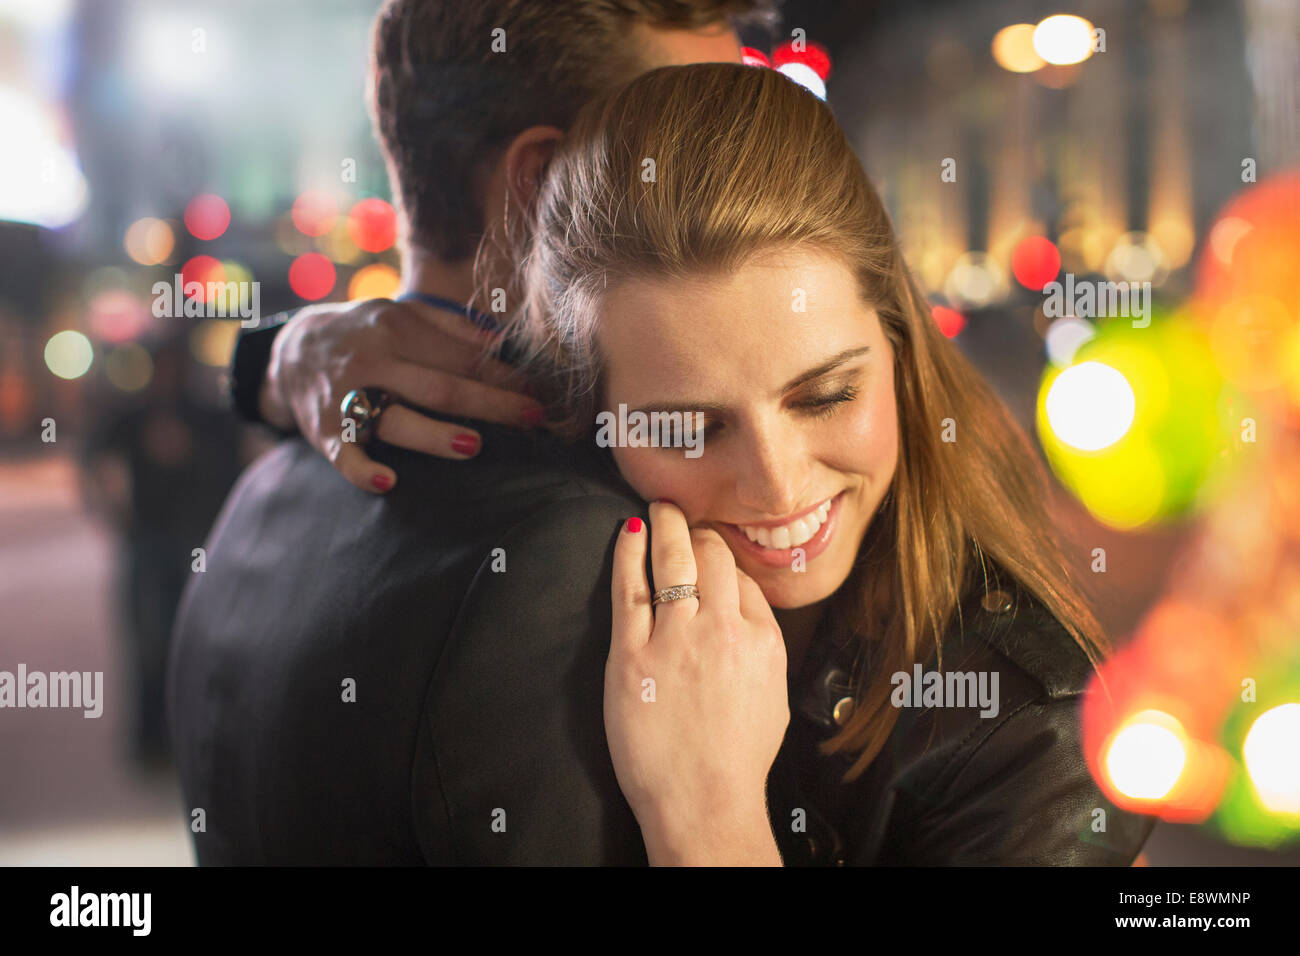 Couple hugging on city street at night - Stock Image